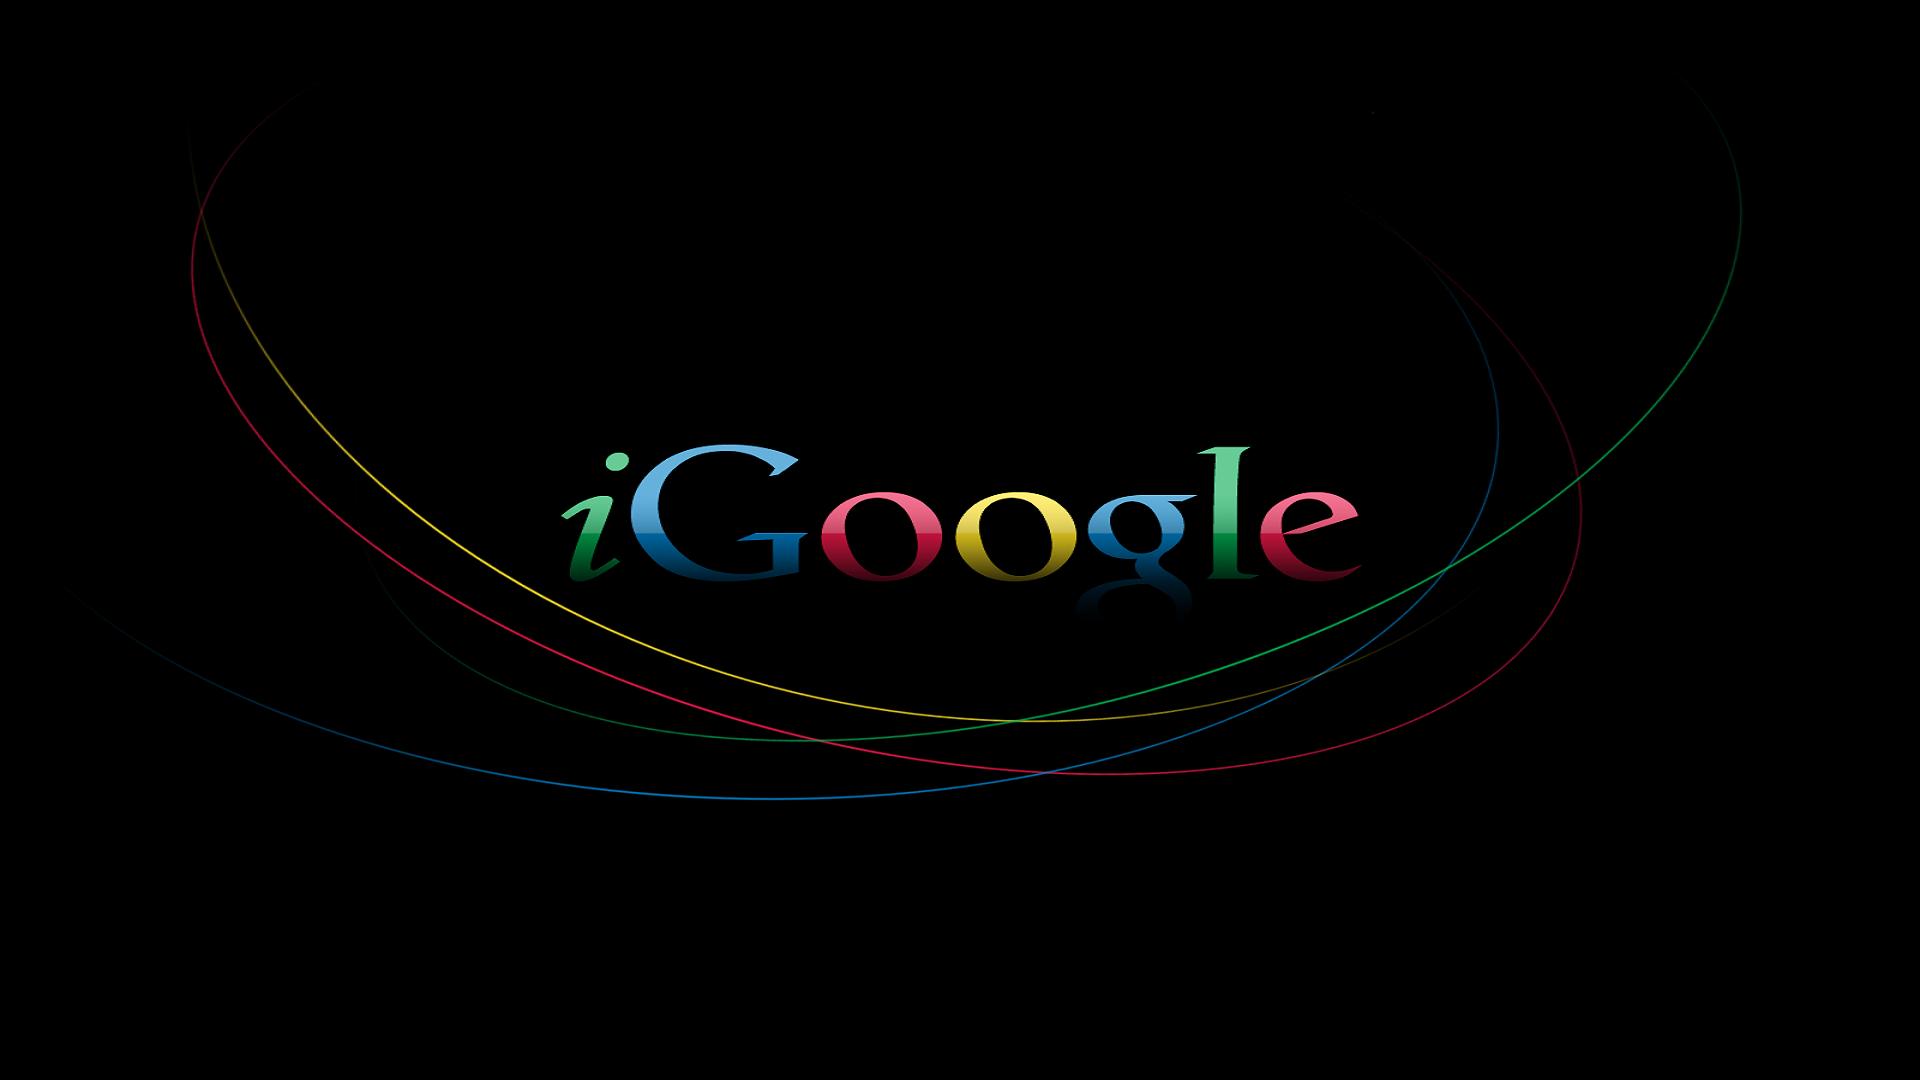 Google now desktop wallpapers omg chrome hd wallpapers pinterest google now desktop wallpapers omg chrome voltagebd Images